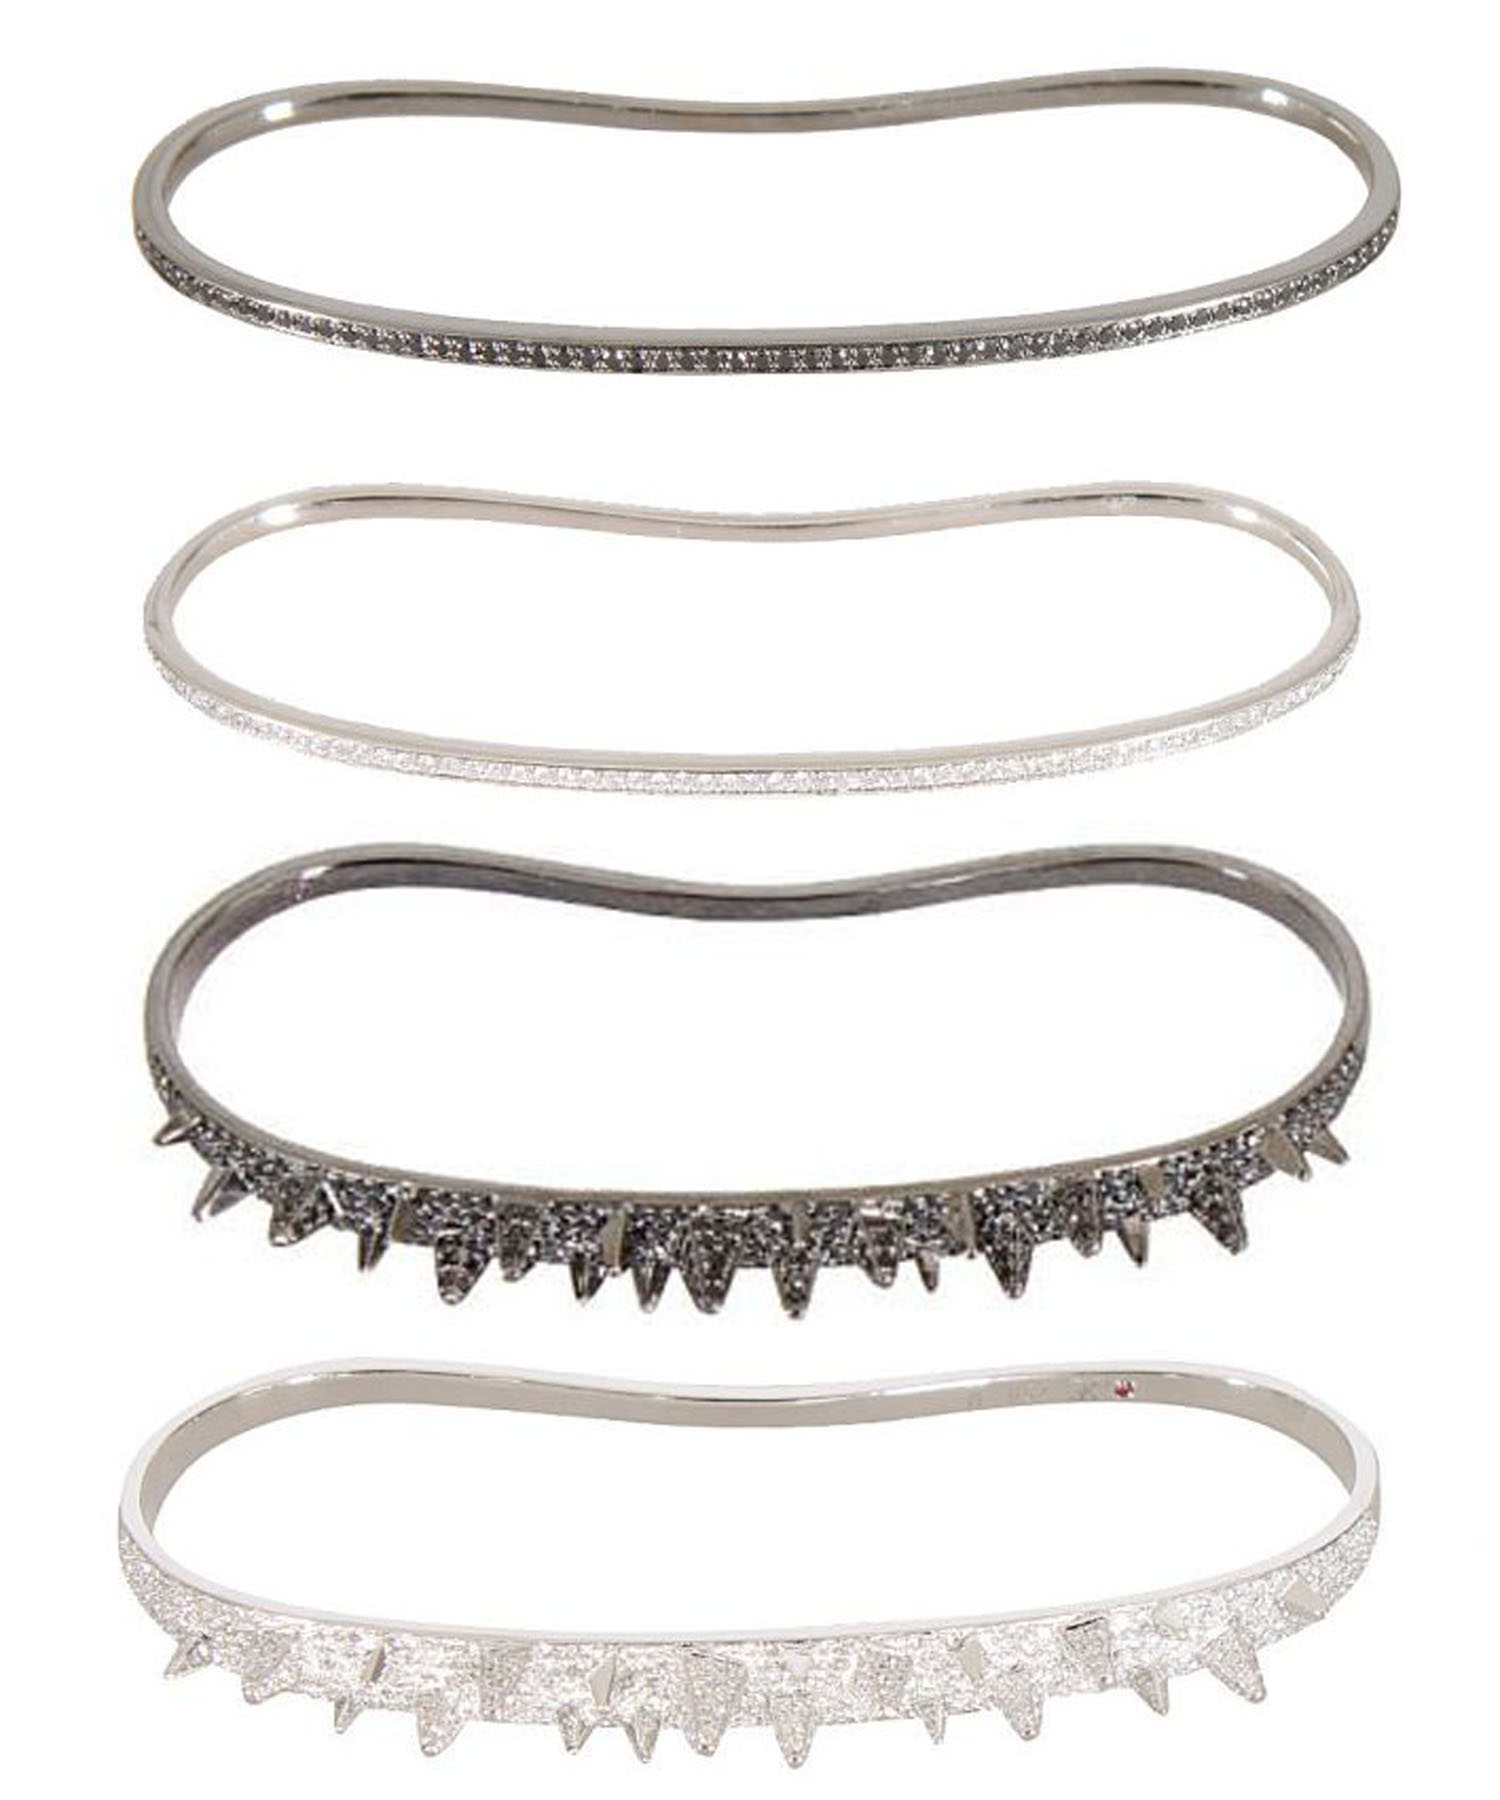 la-modella-mafia-Diamond-Hand-Bracelets